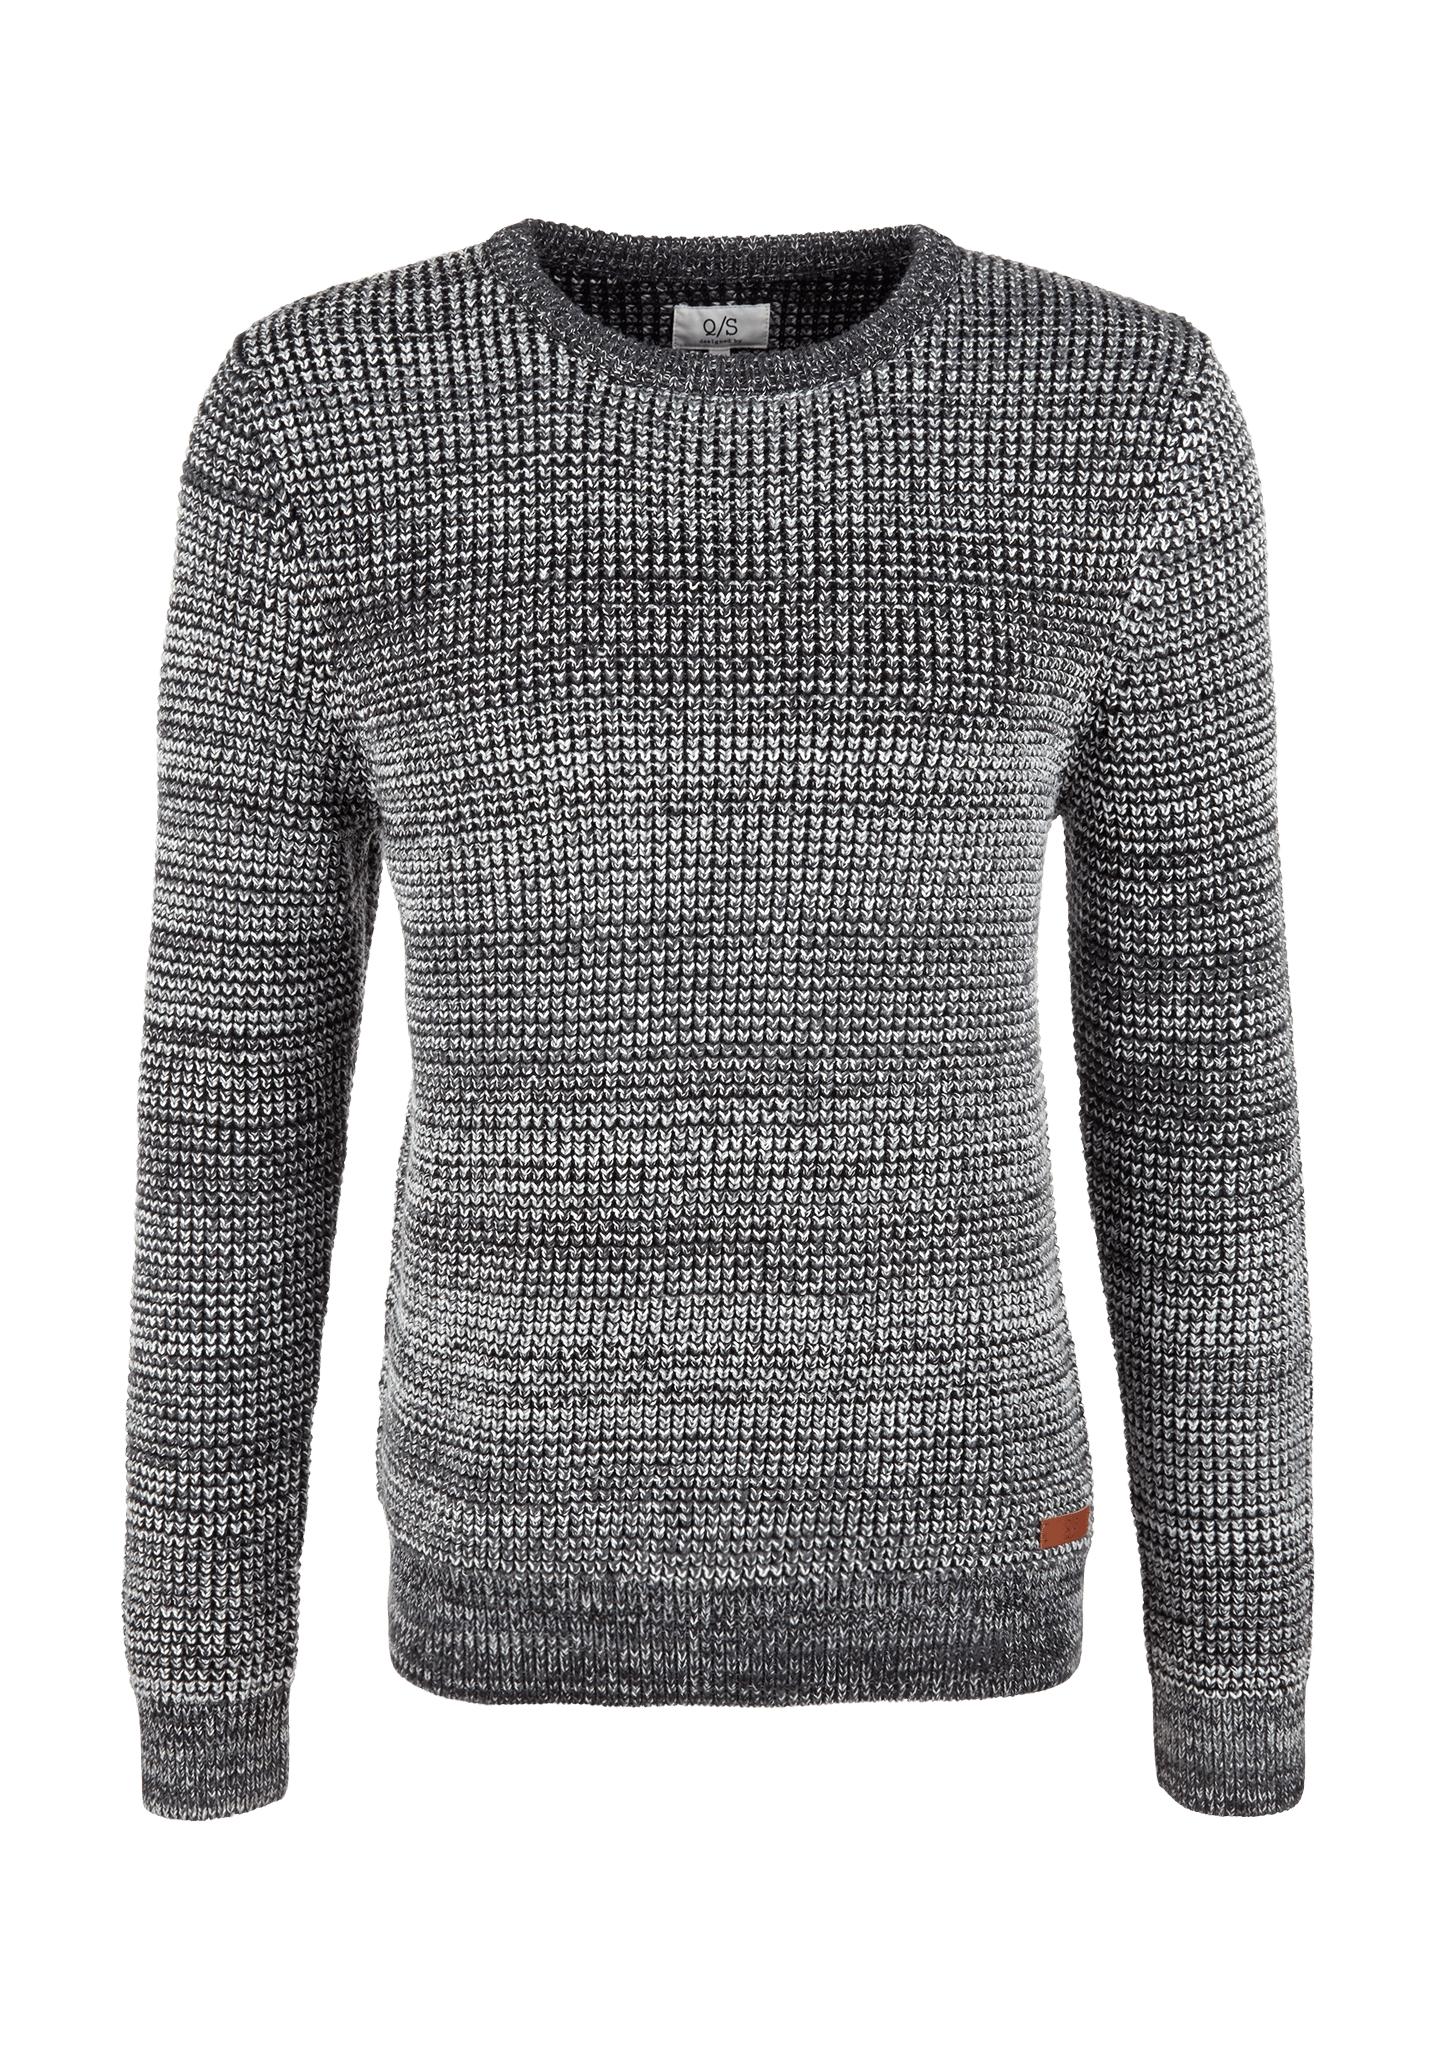 Strickpullover | Bekleidung > Pullover | Q/S designed by